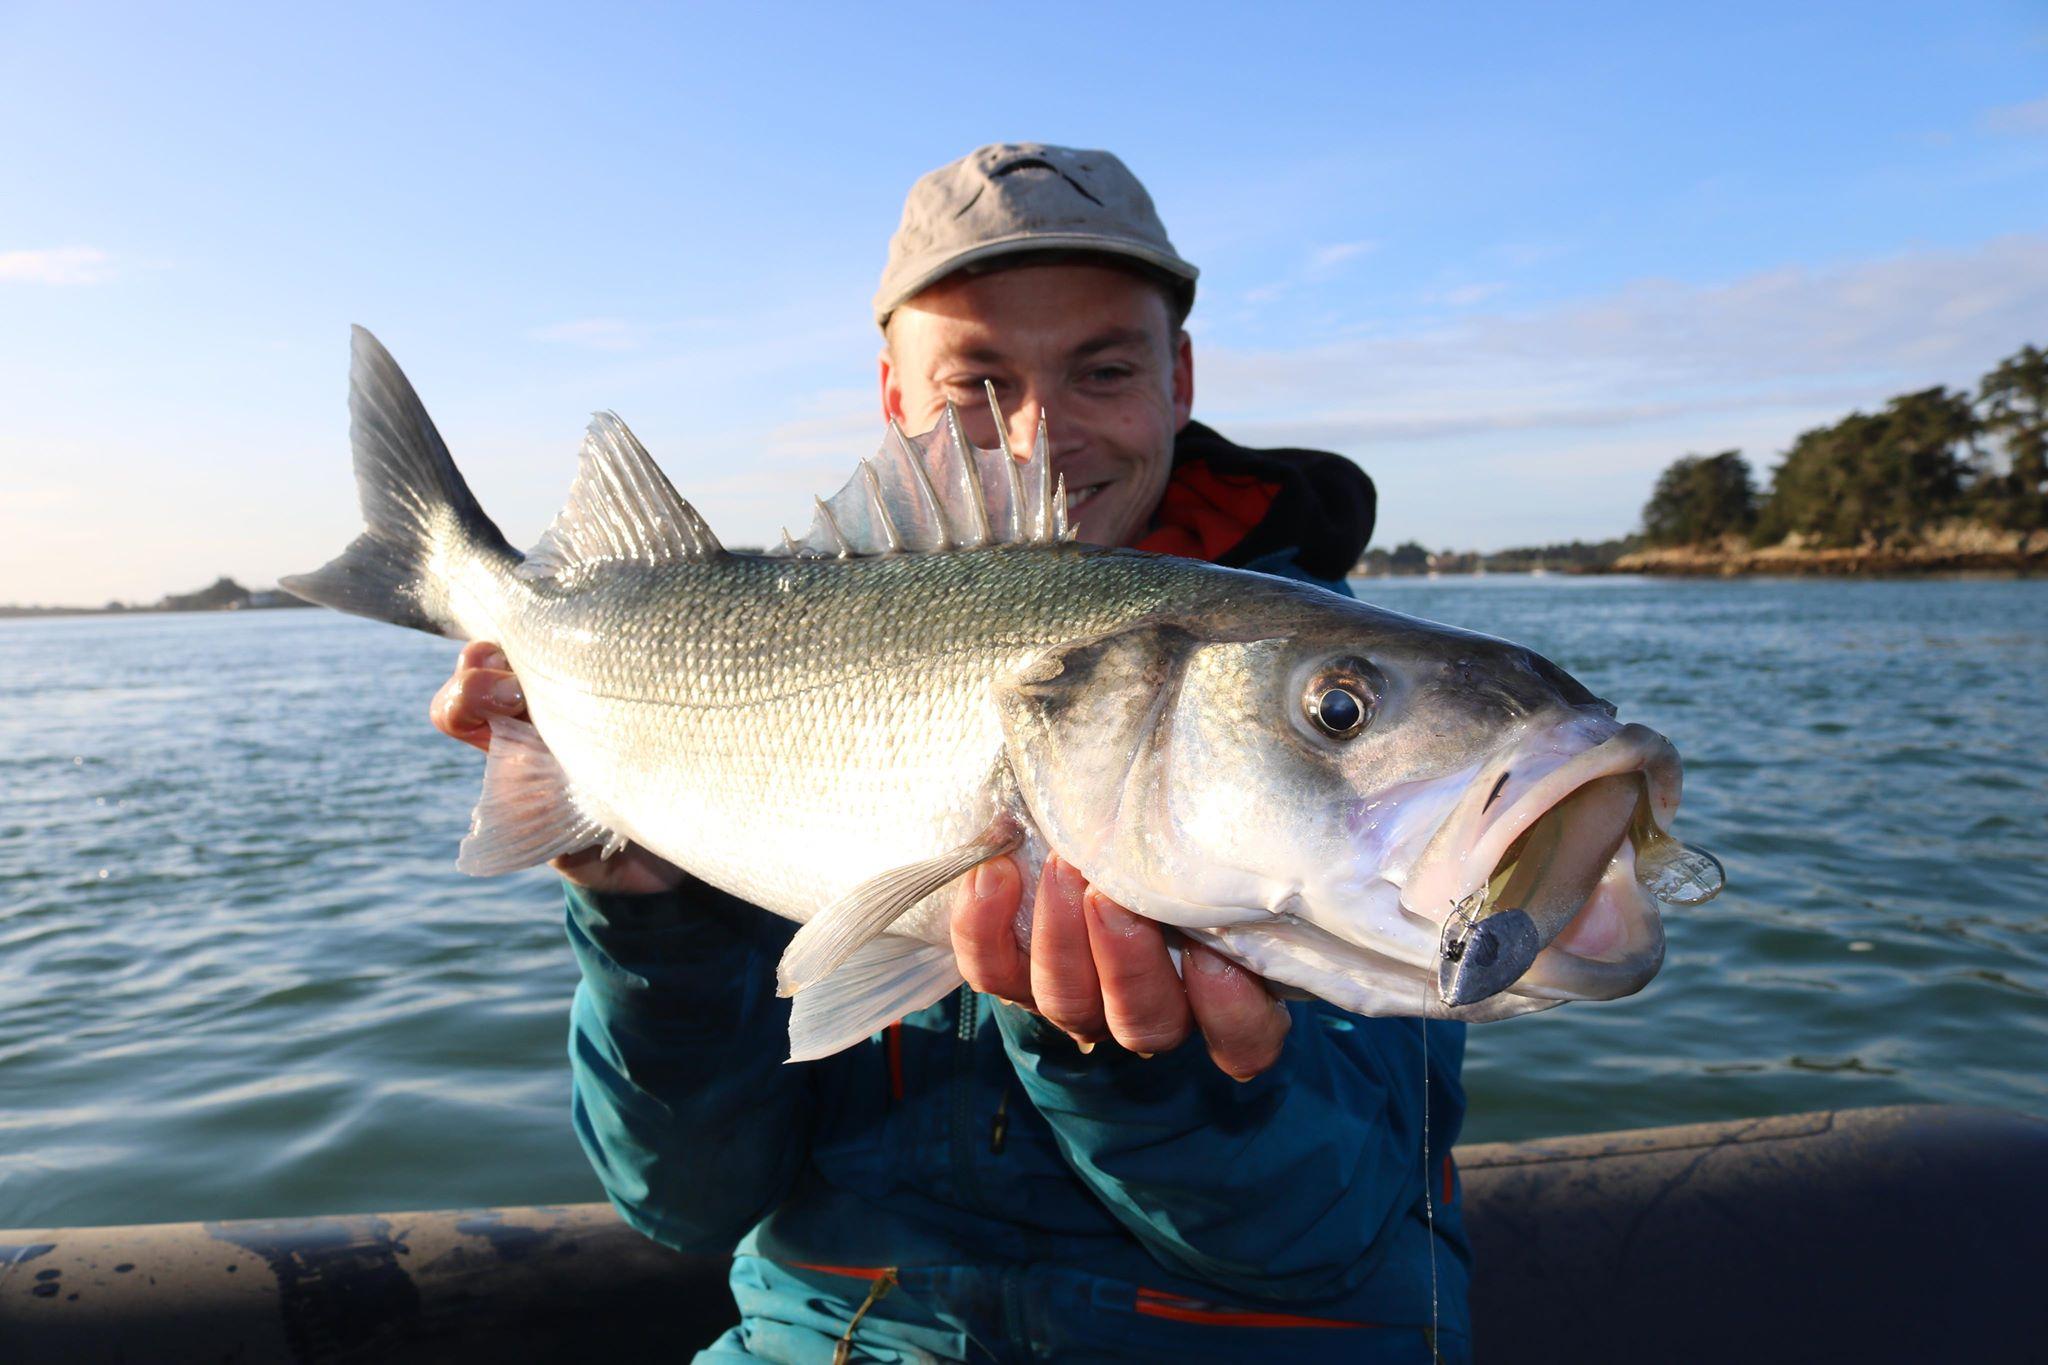 peche au bar labrax lurattak hot rod intuition peche golfe du morbihan gros bar bretagne poisson meilleur leurre de peche relax